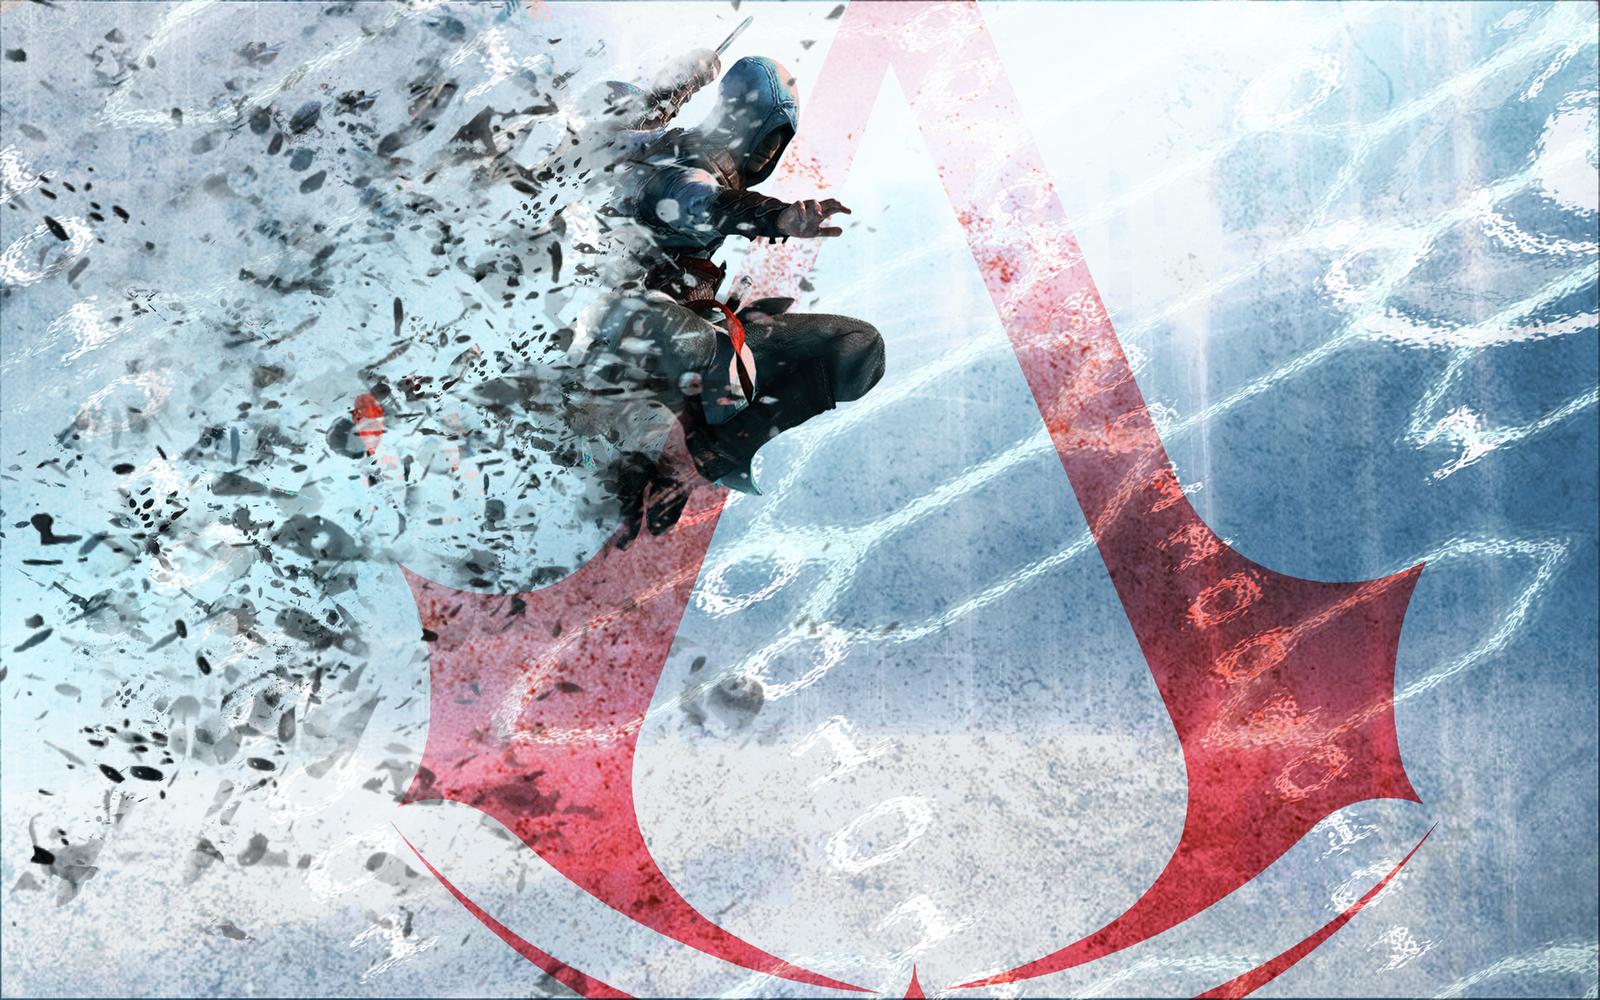 Assassins Creed hd Wallpapers 1080p Assassin Creed hd Wallpaper